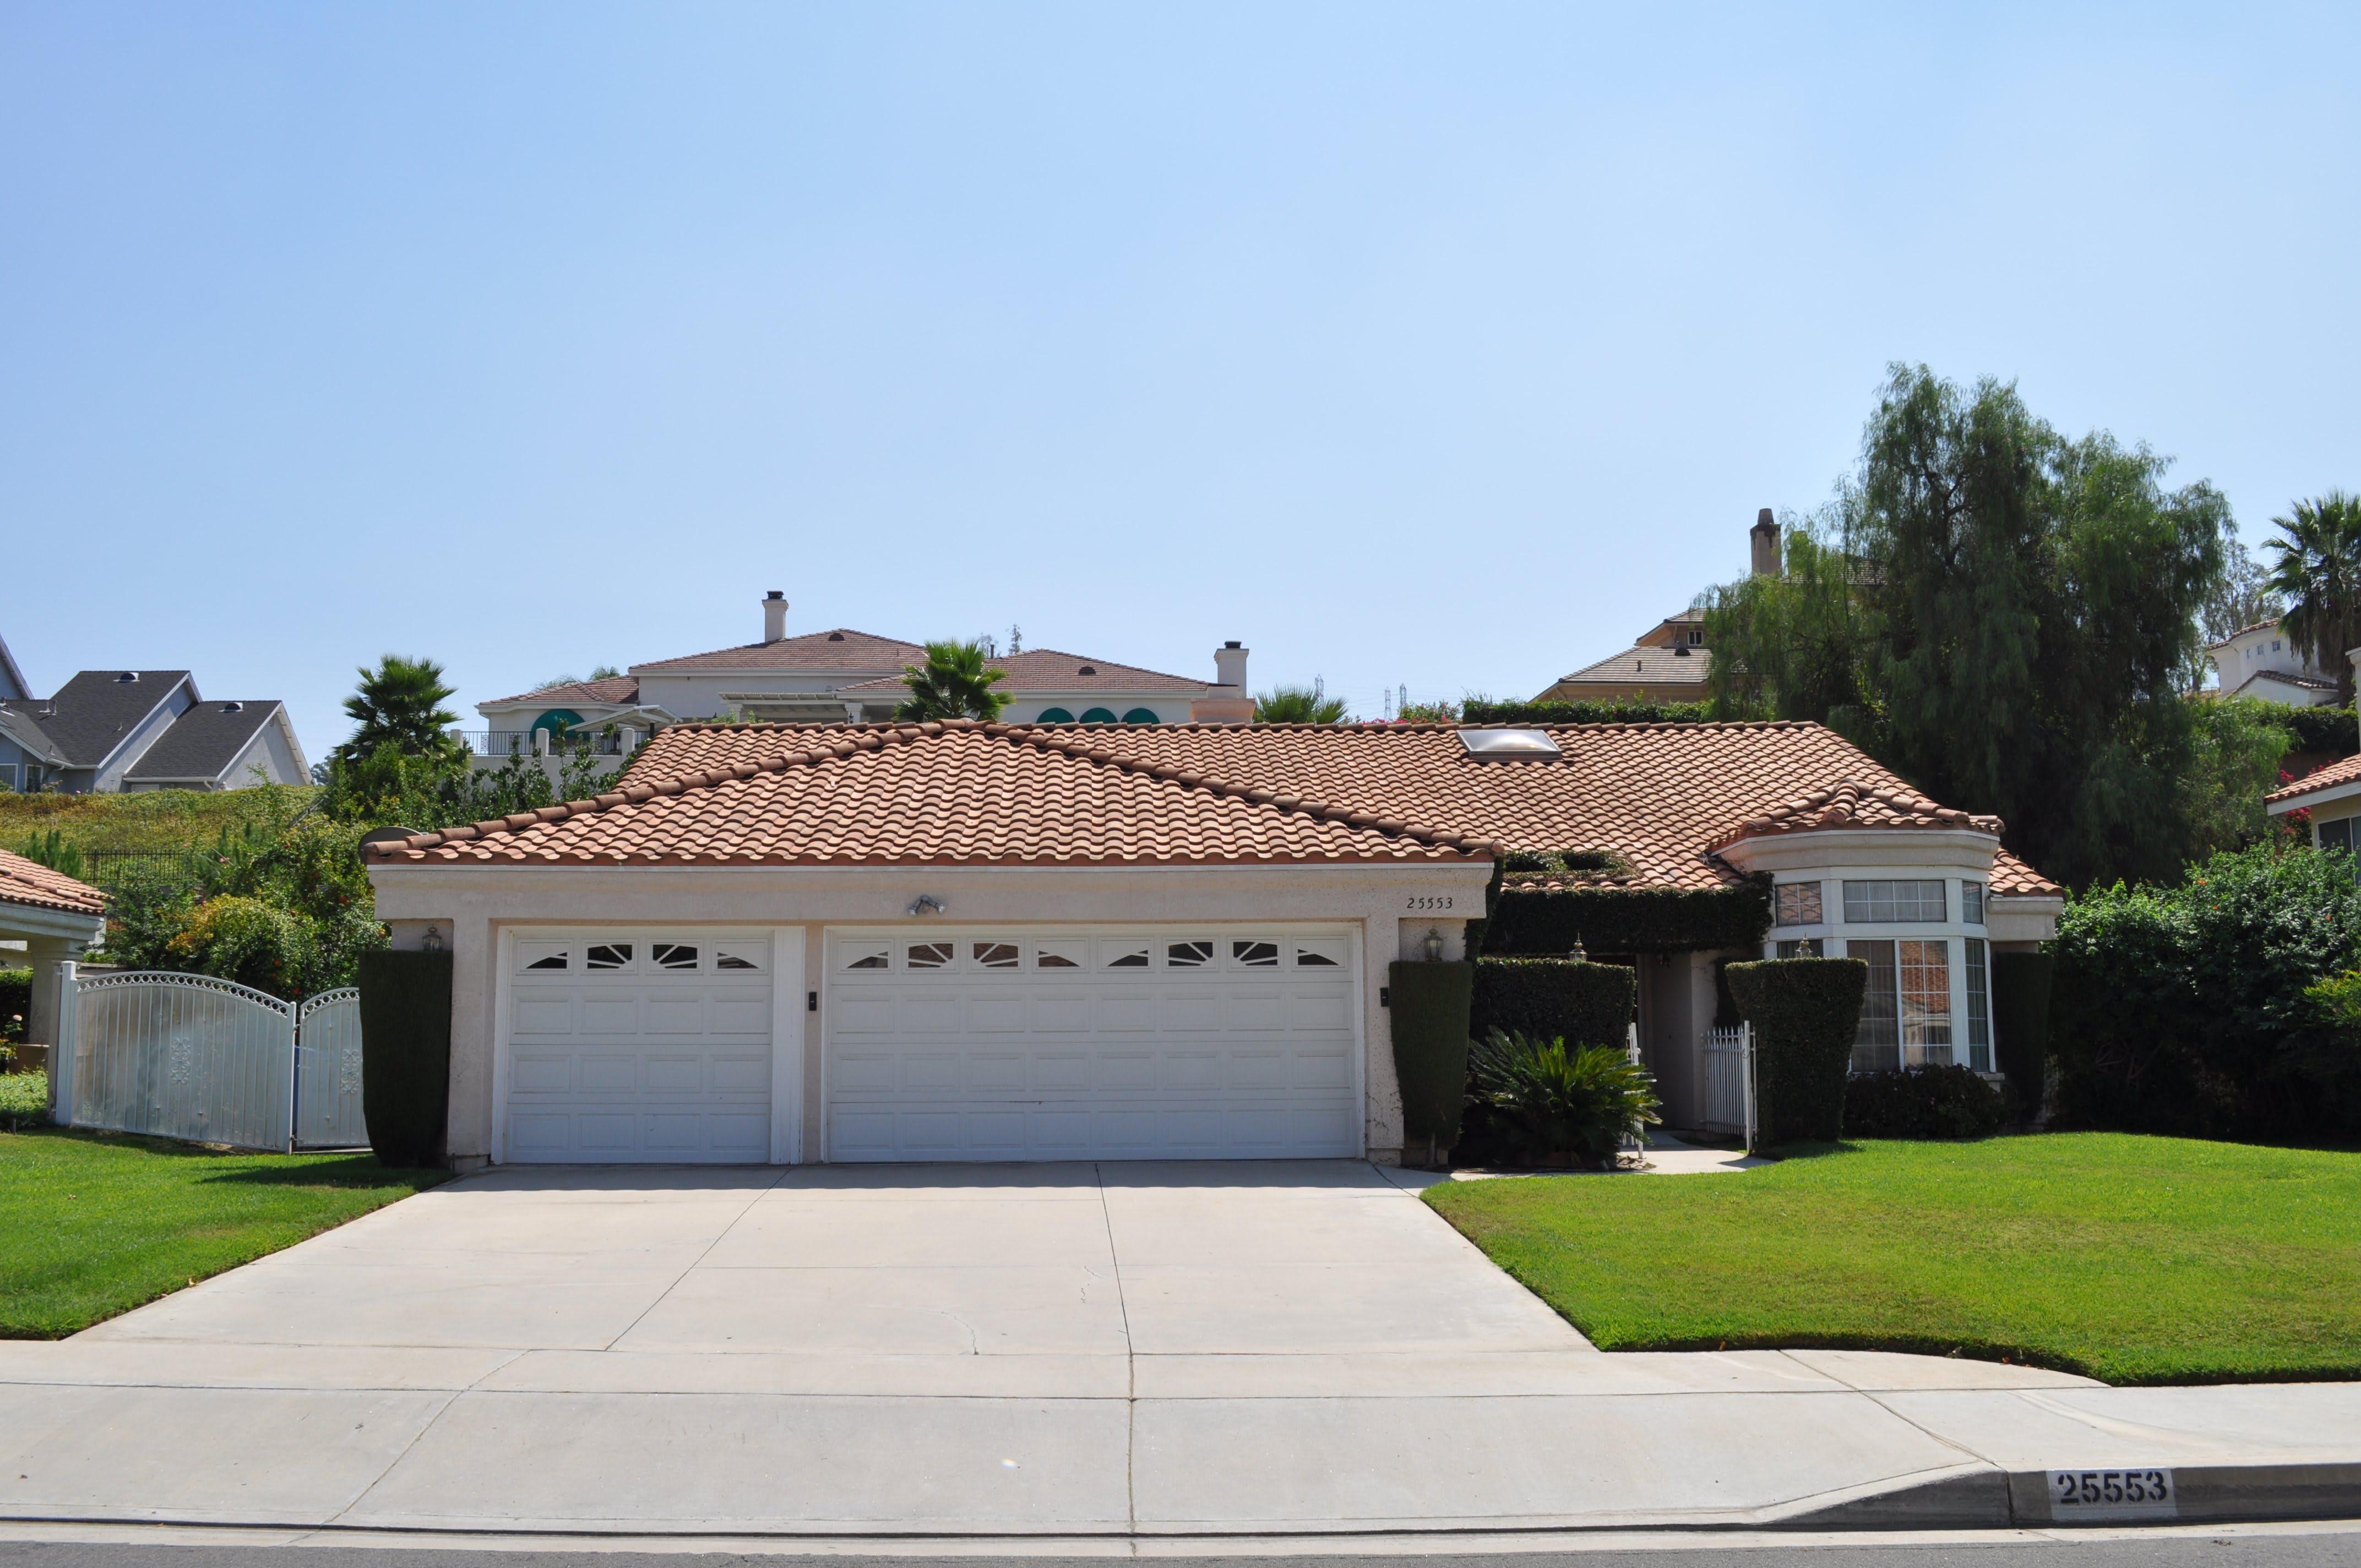 Photo 1 of Home Care of Loma Linda